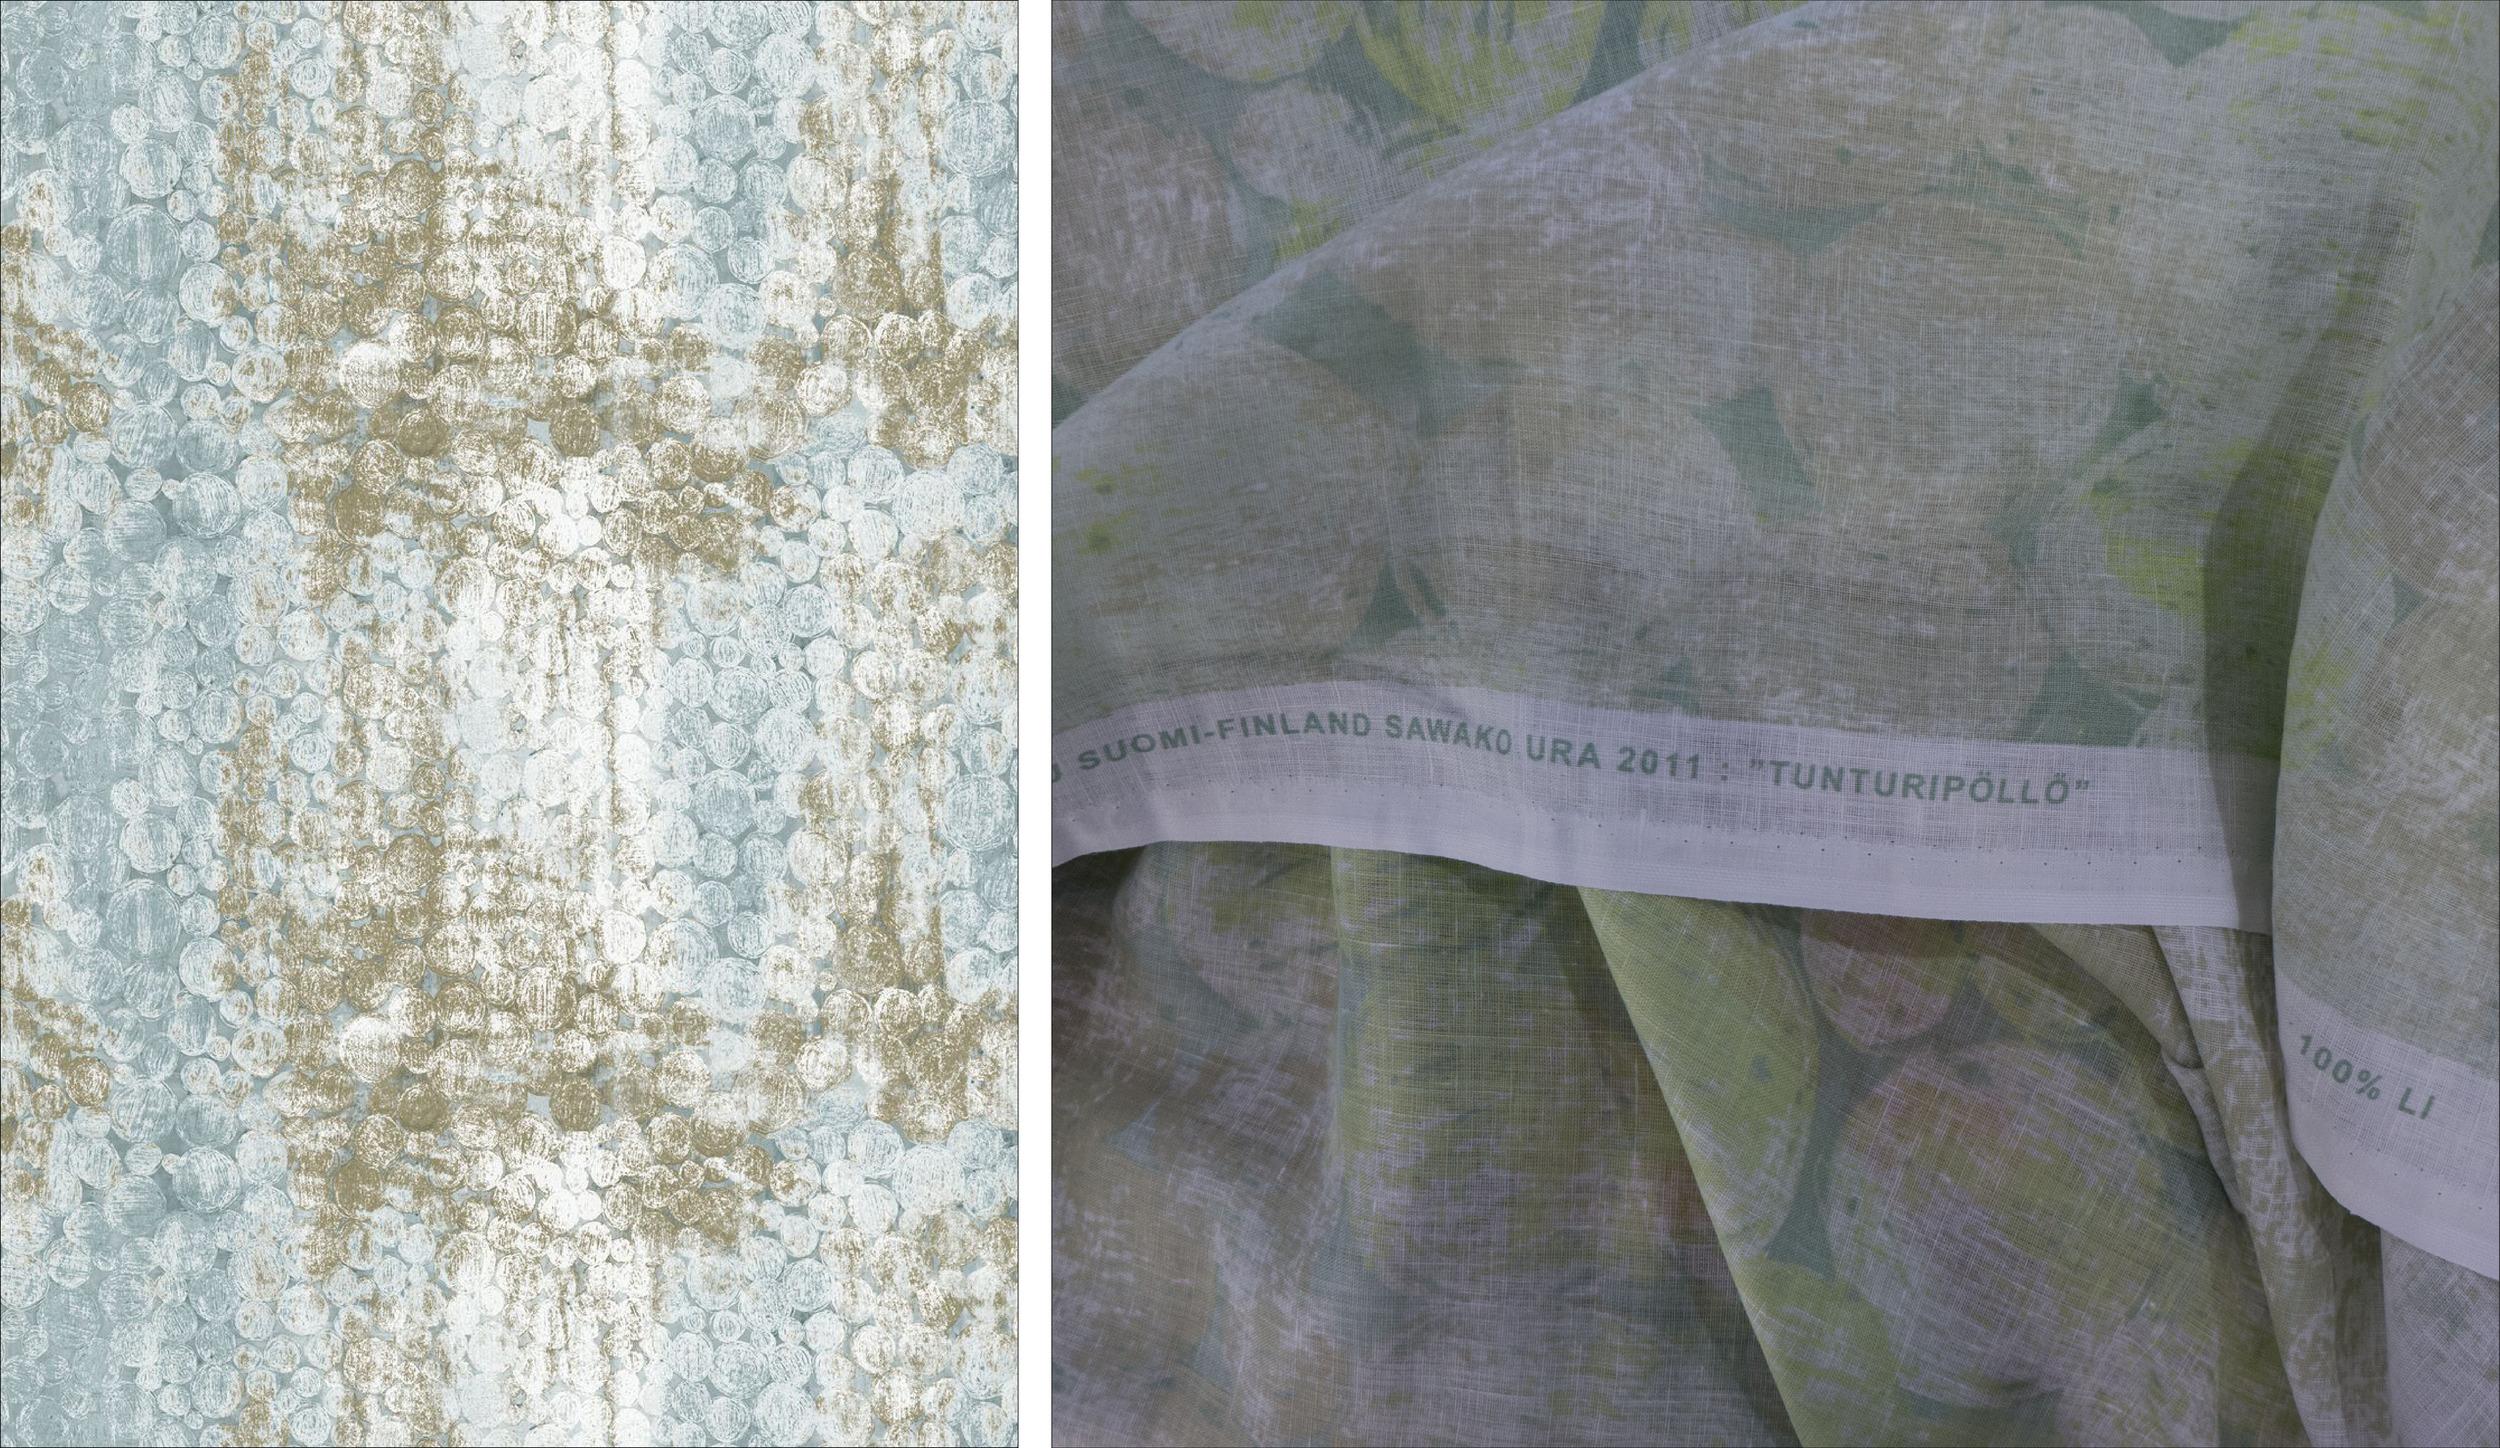 Tunturipöllö - Marimekko fabrics are identified on the selvedge with the name of the designer - here Sawako Ura - and the date of the design